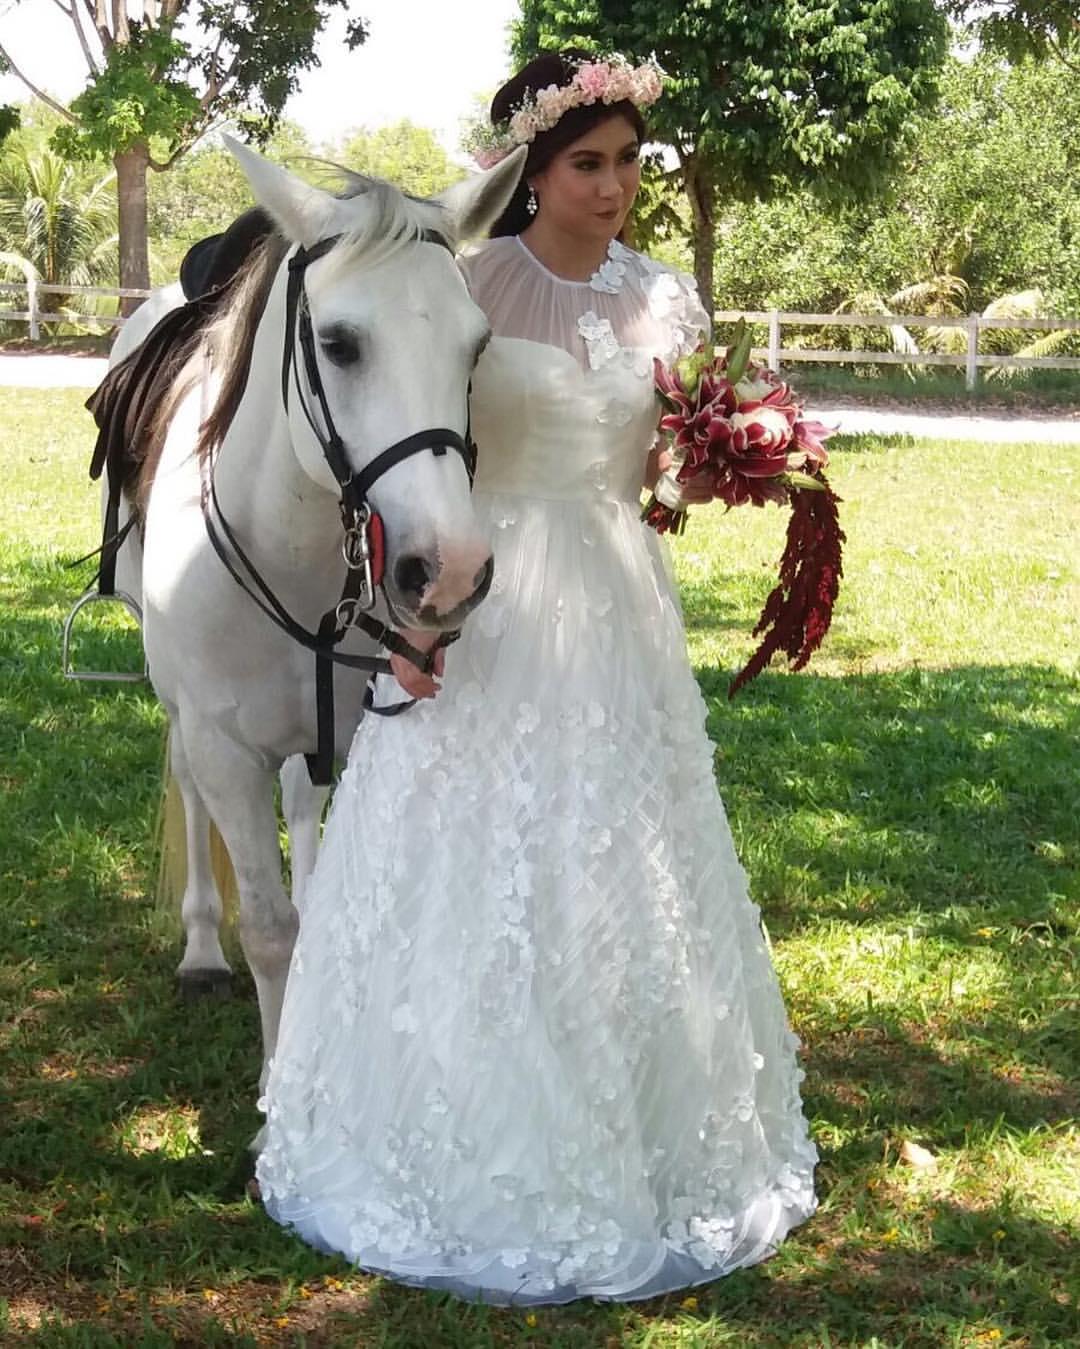 photoshoot MM2020 Horse Adventure